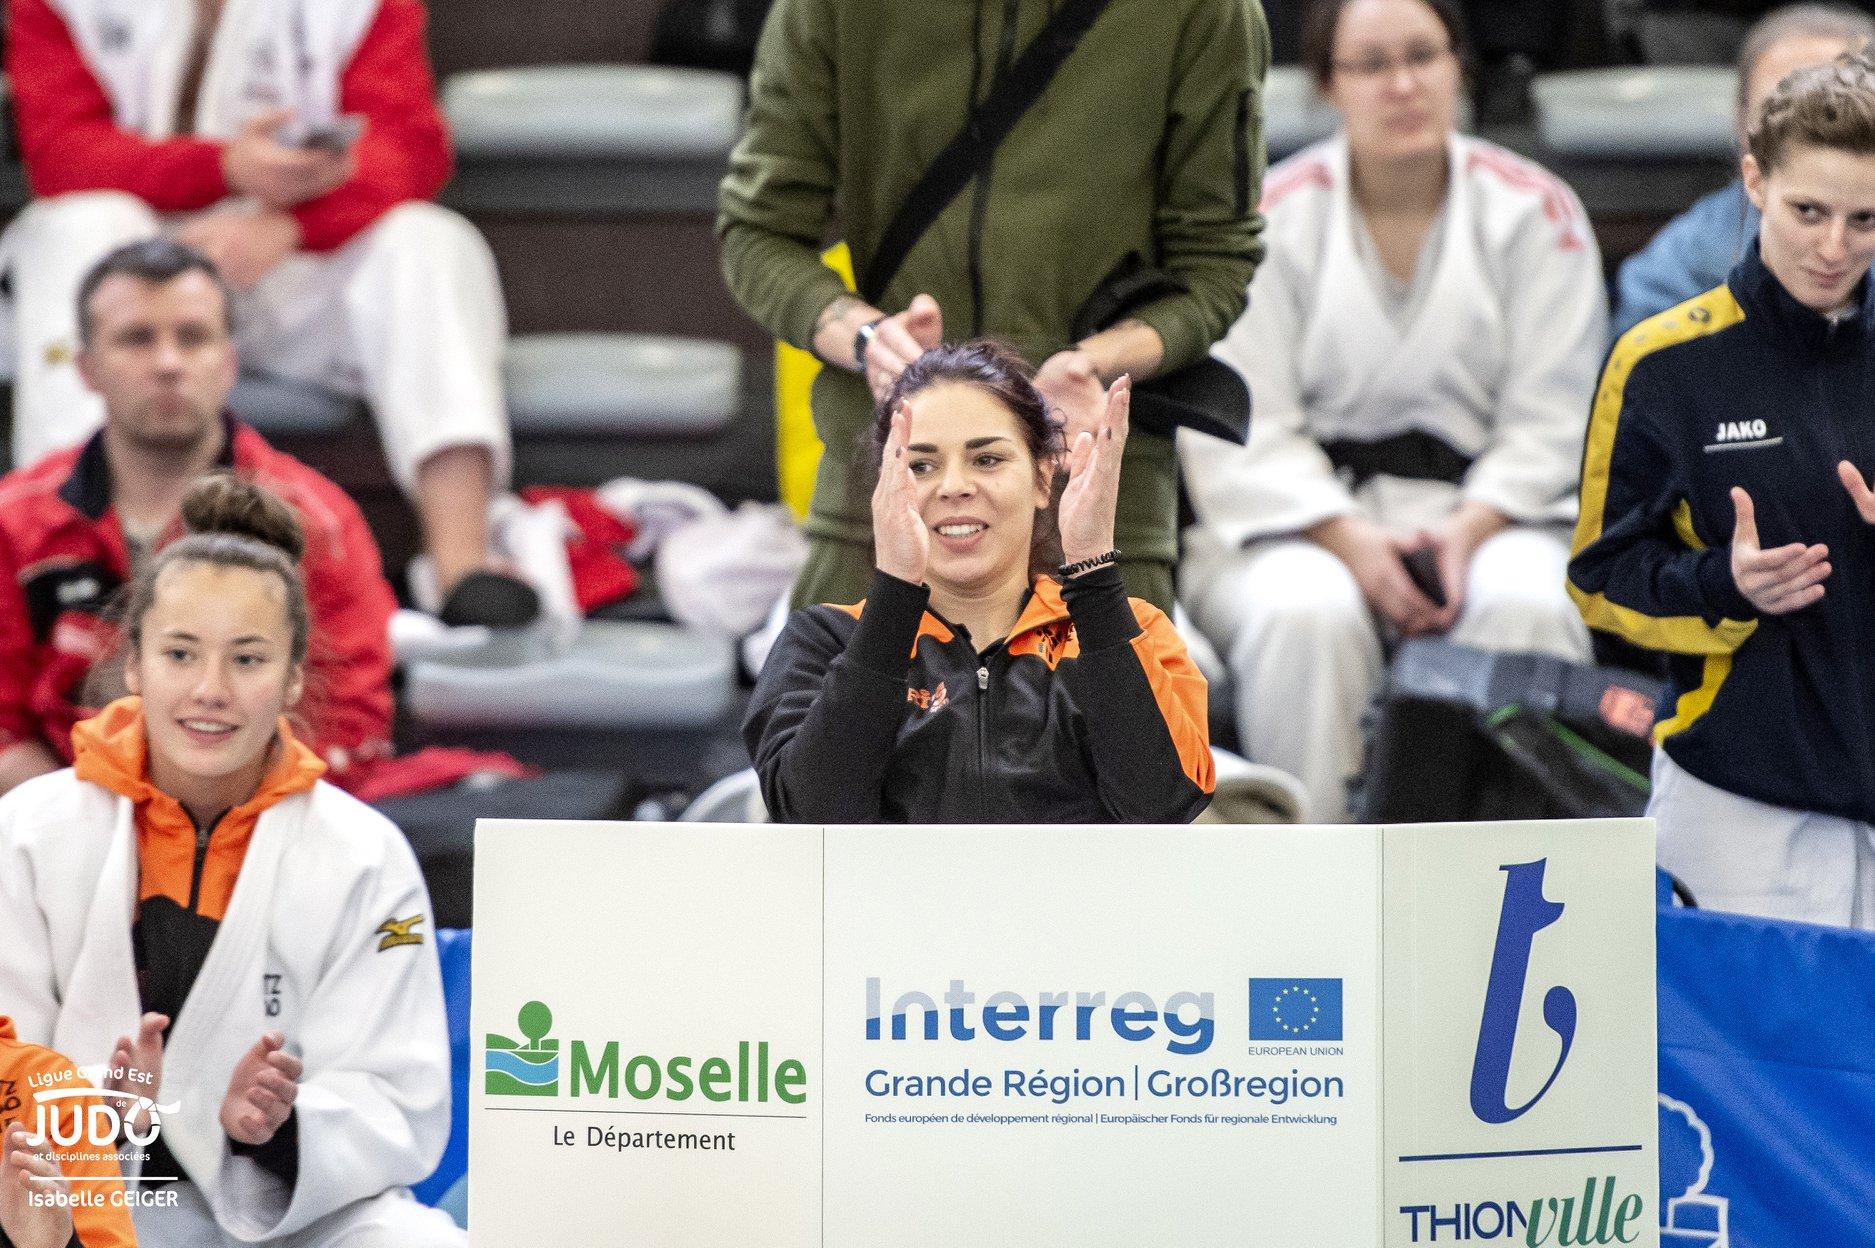 Interreg Judo Competition - Thionville 27-28.04.2019